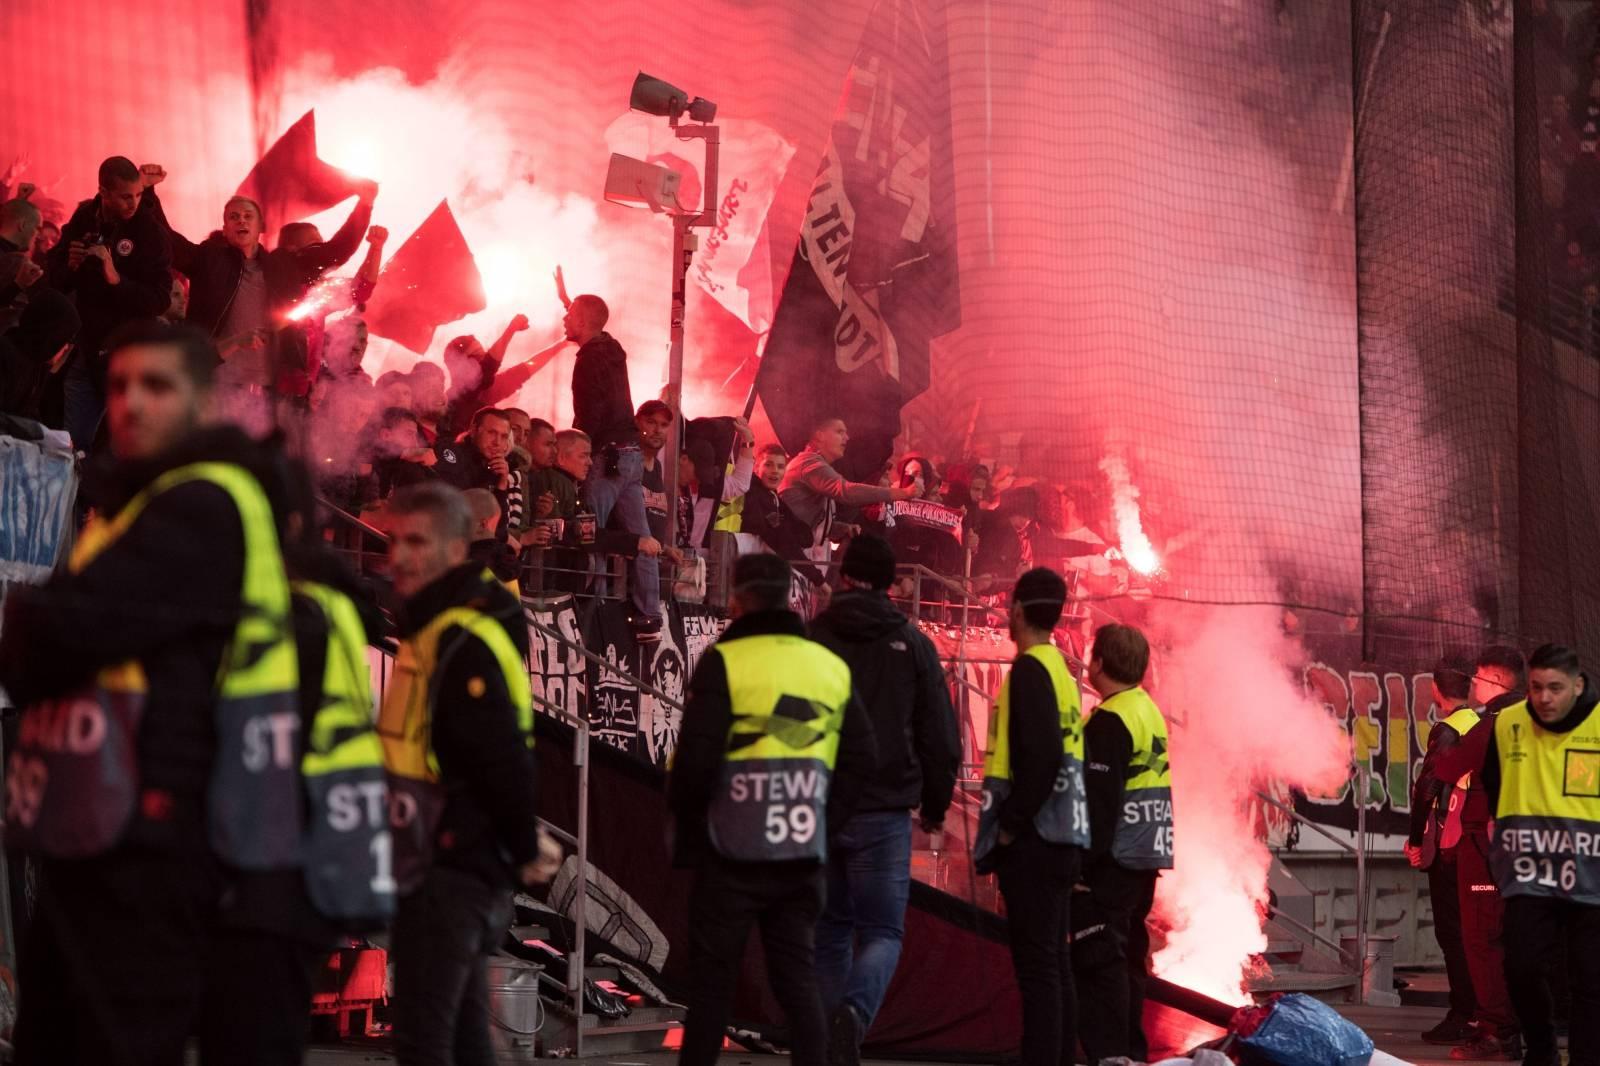 Soccer Europa League / Eintracht Frankfurt - Lazio Rome 4: 1.